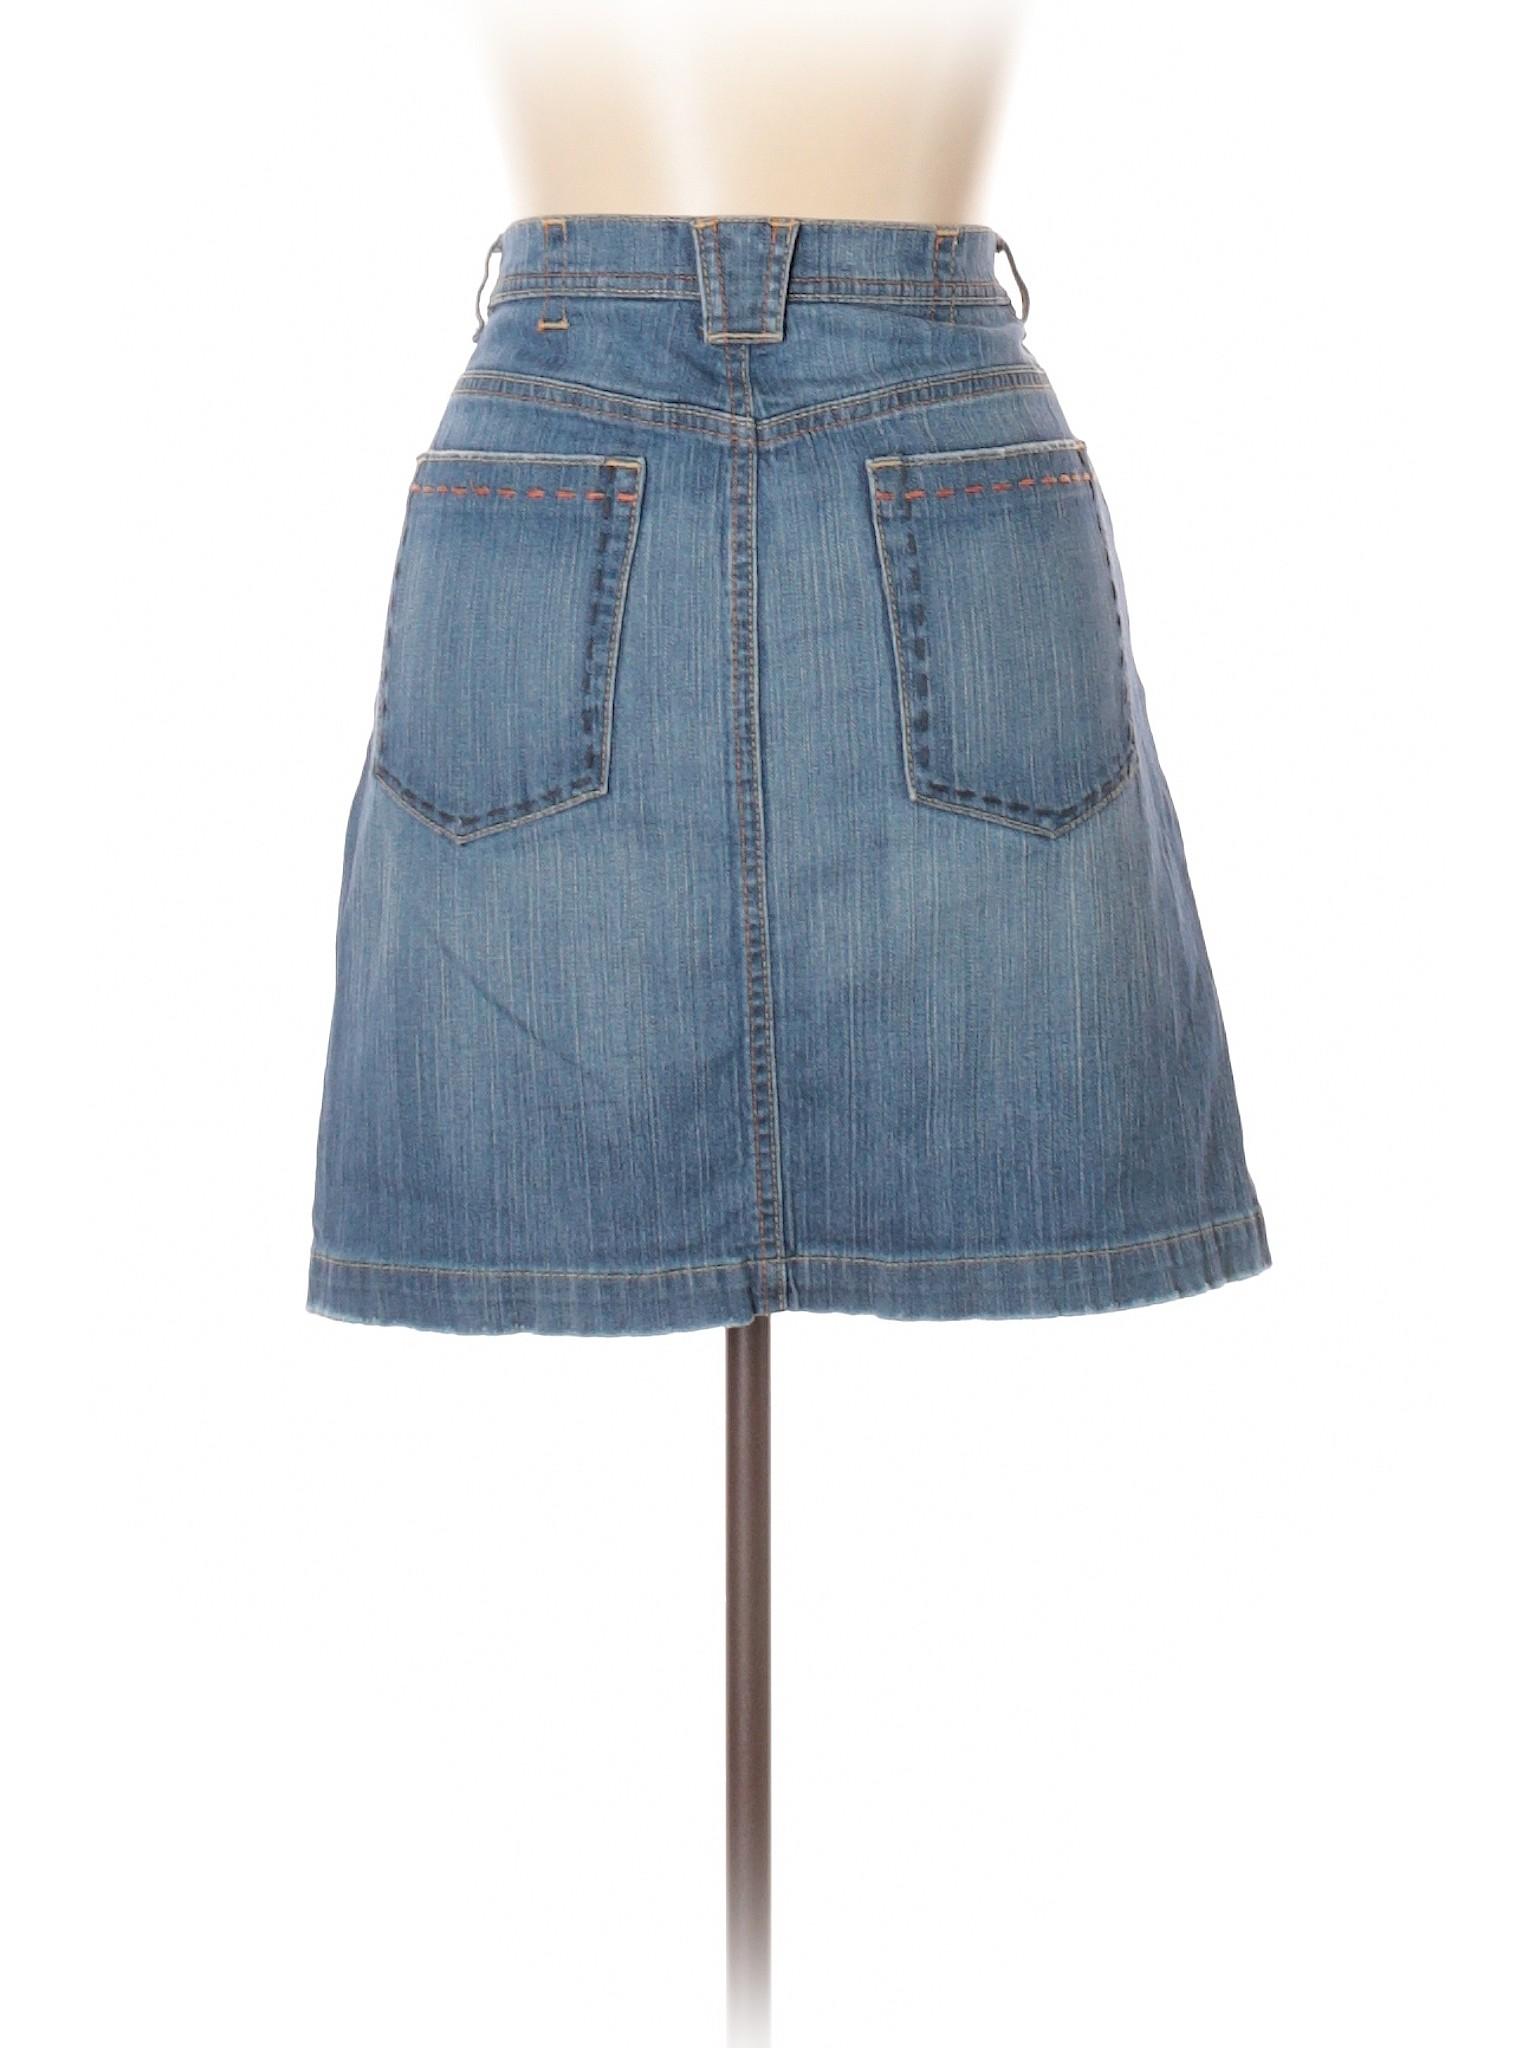 Boutique Skirt Denim Denim Skirt Denim Boutique Skirt Boutique Boutique Denim qBA0g0w